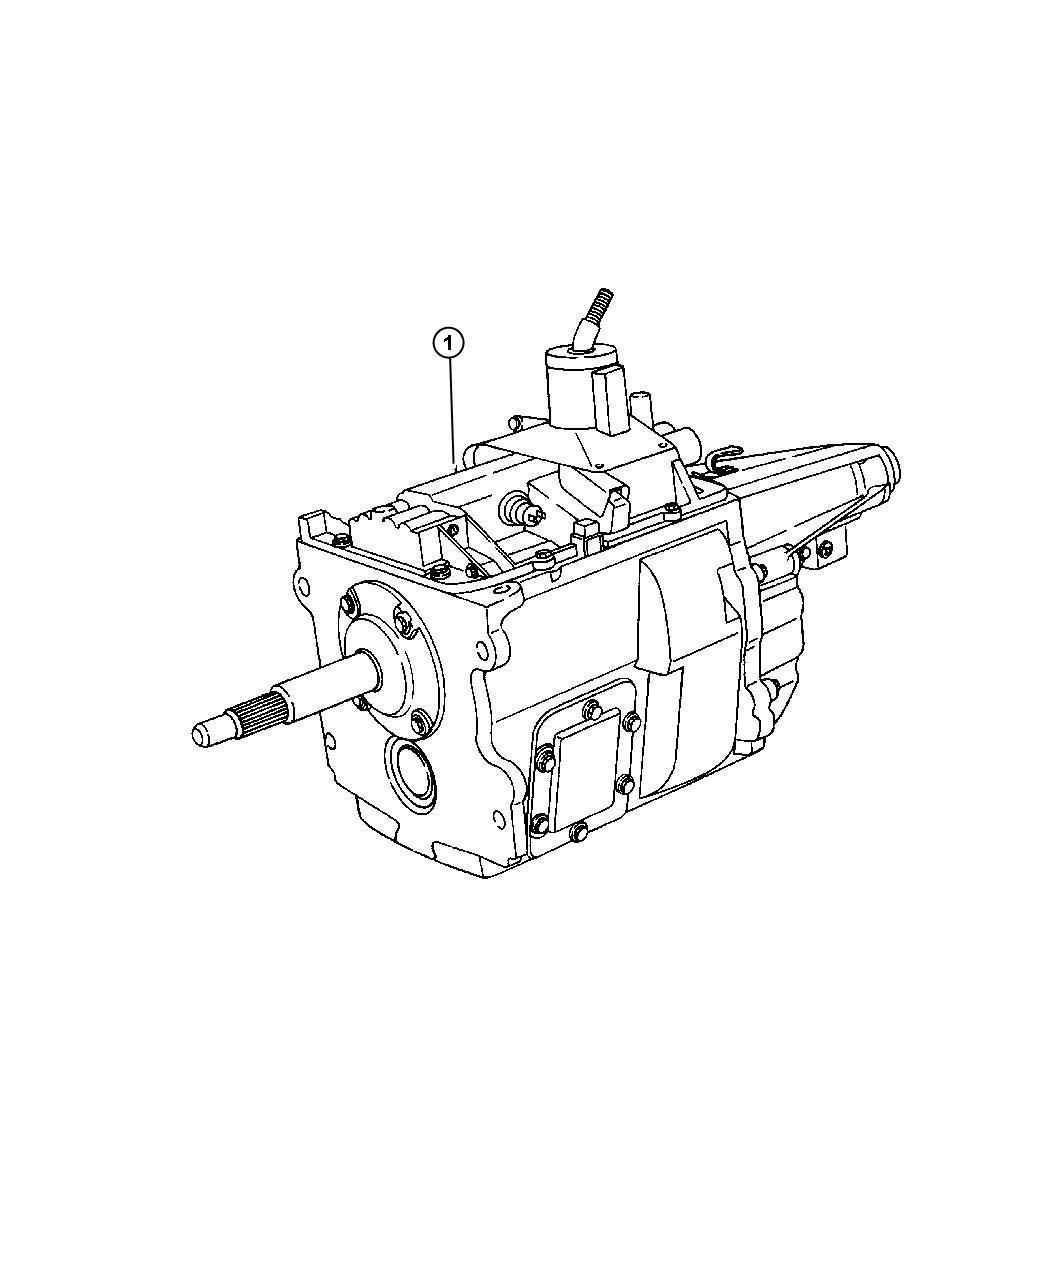 1999 dodge ram 1500 trans  5 speed  transmission  manual  assembly